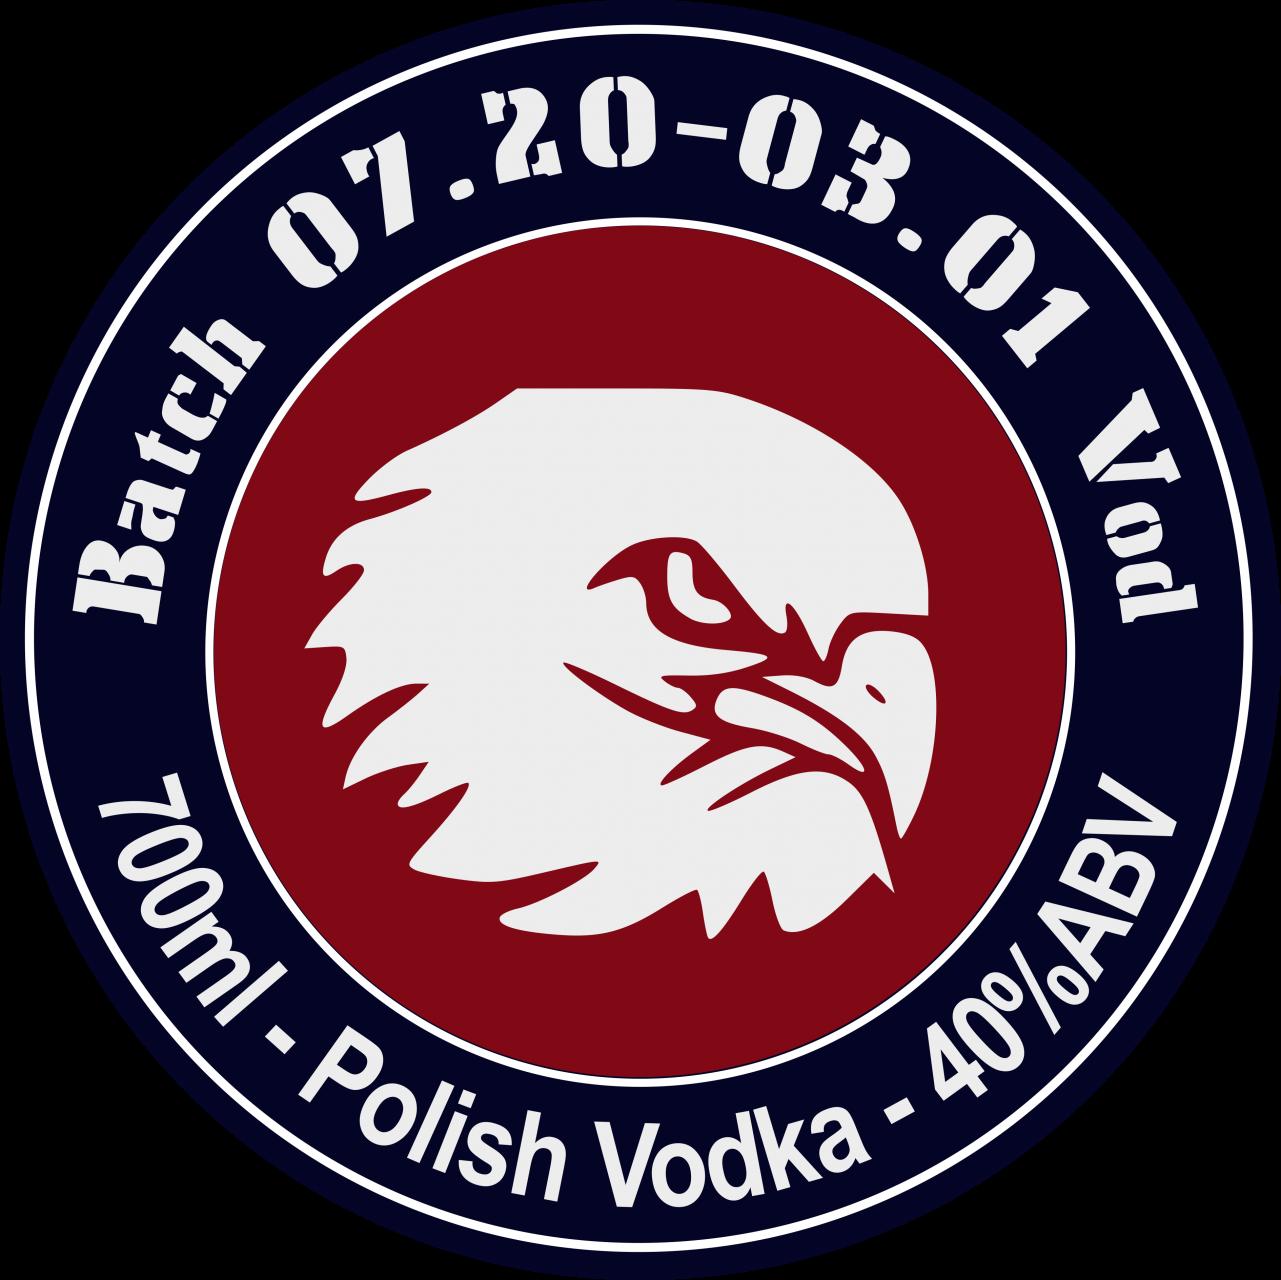 Batch 07.20 - 03.01 Vod